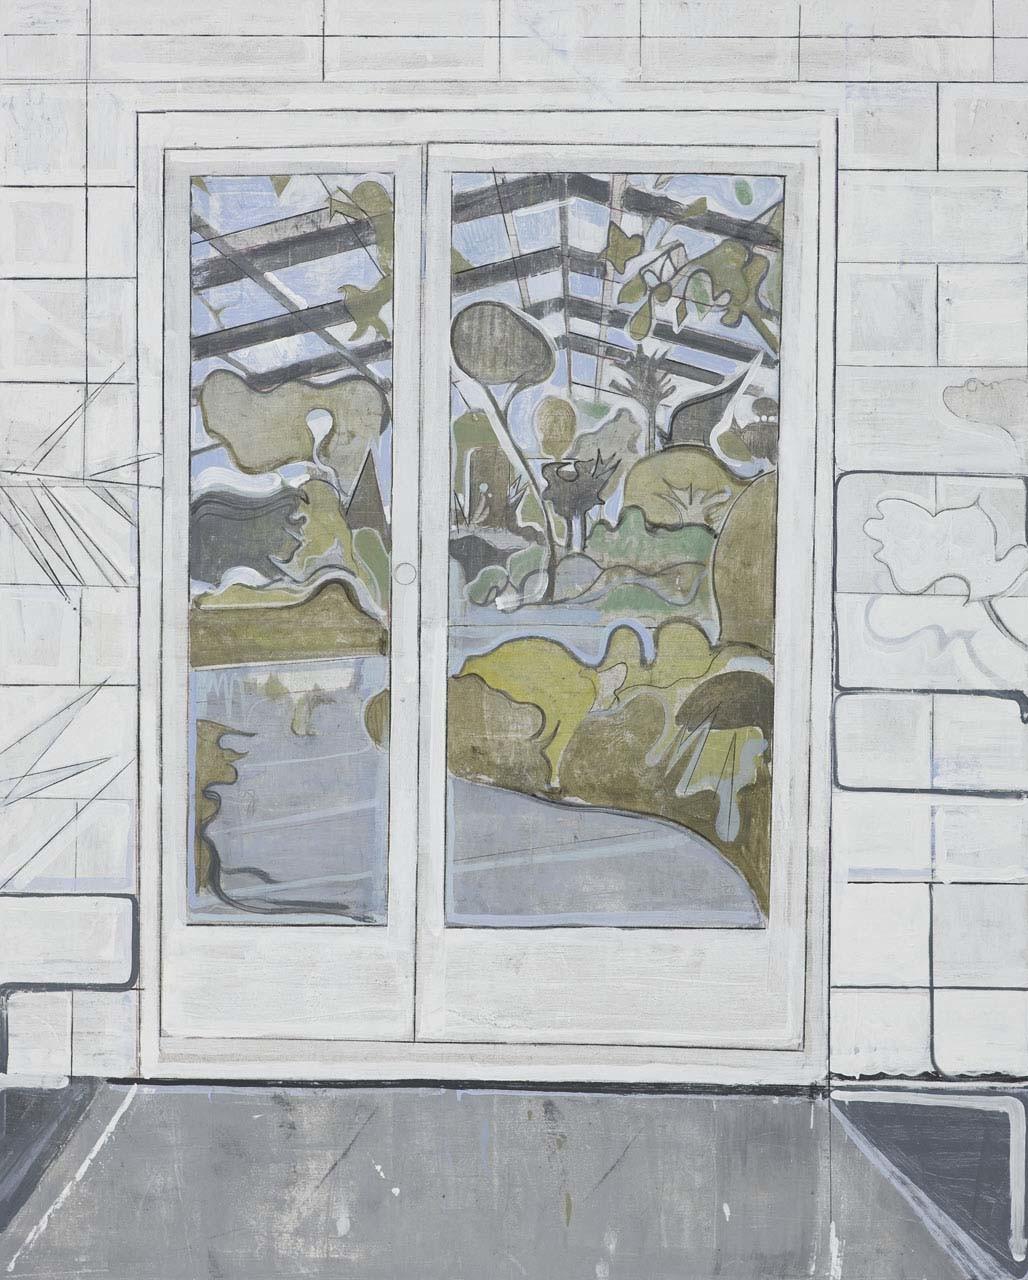 <p>Untitled (entrance to botanical garden),2008</p><p></p>